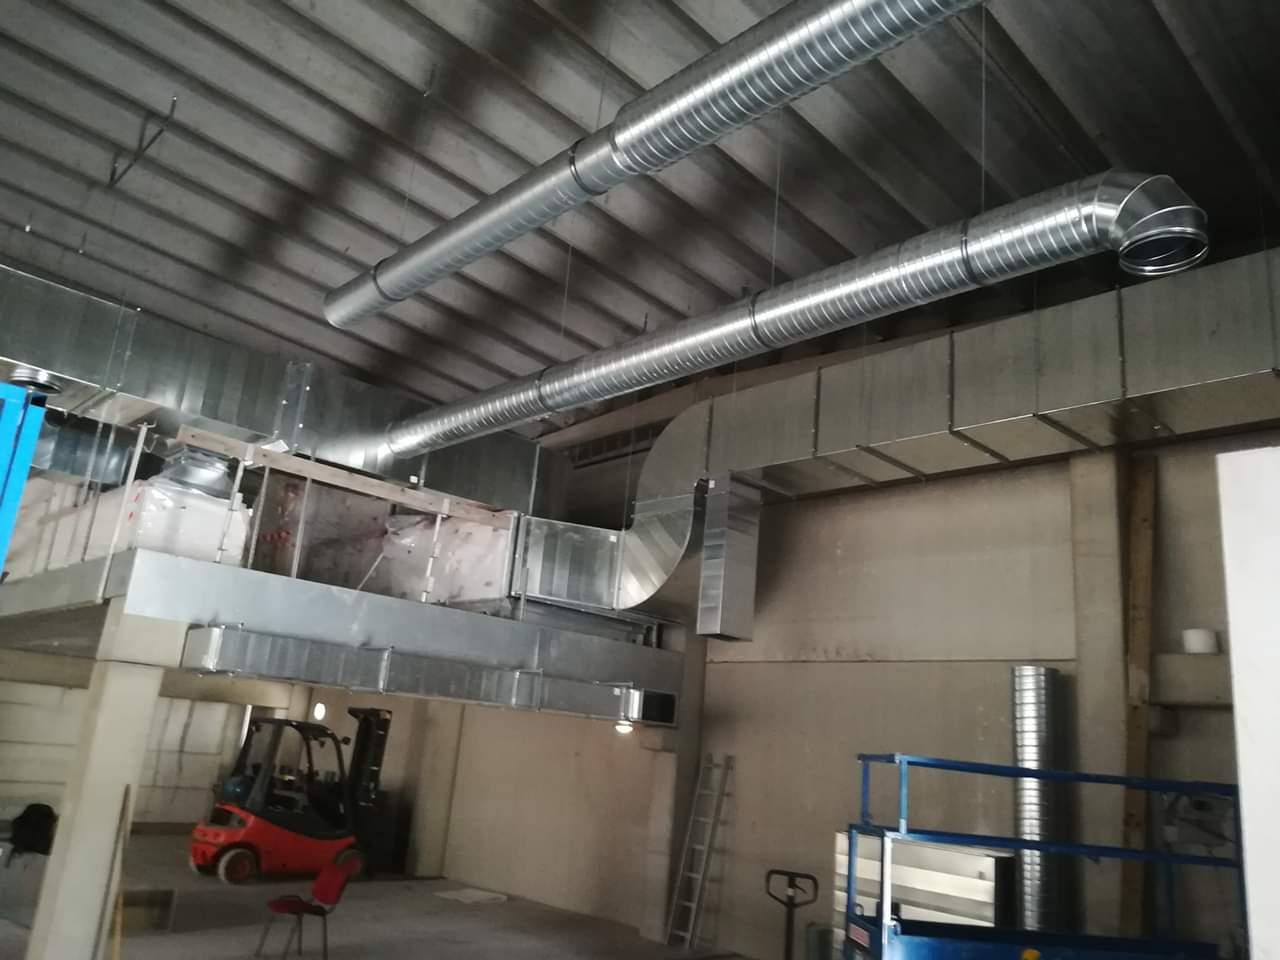 ventilaclean-galery- (7)